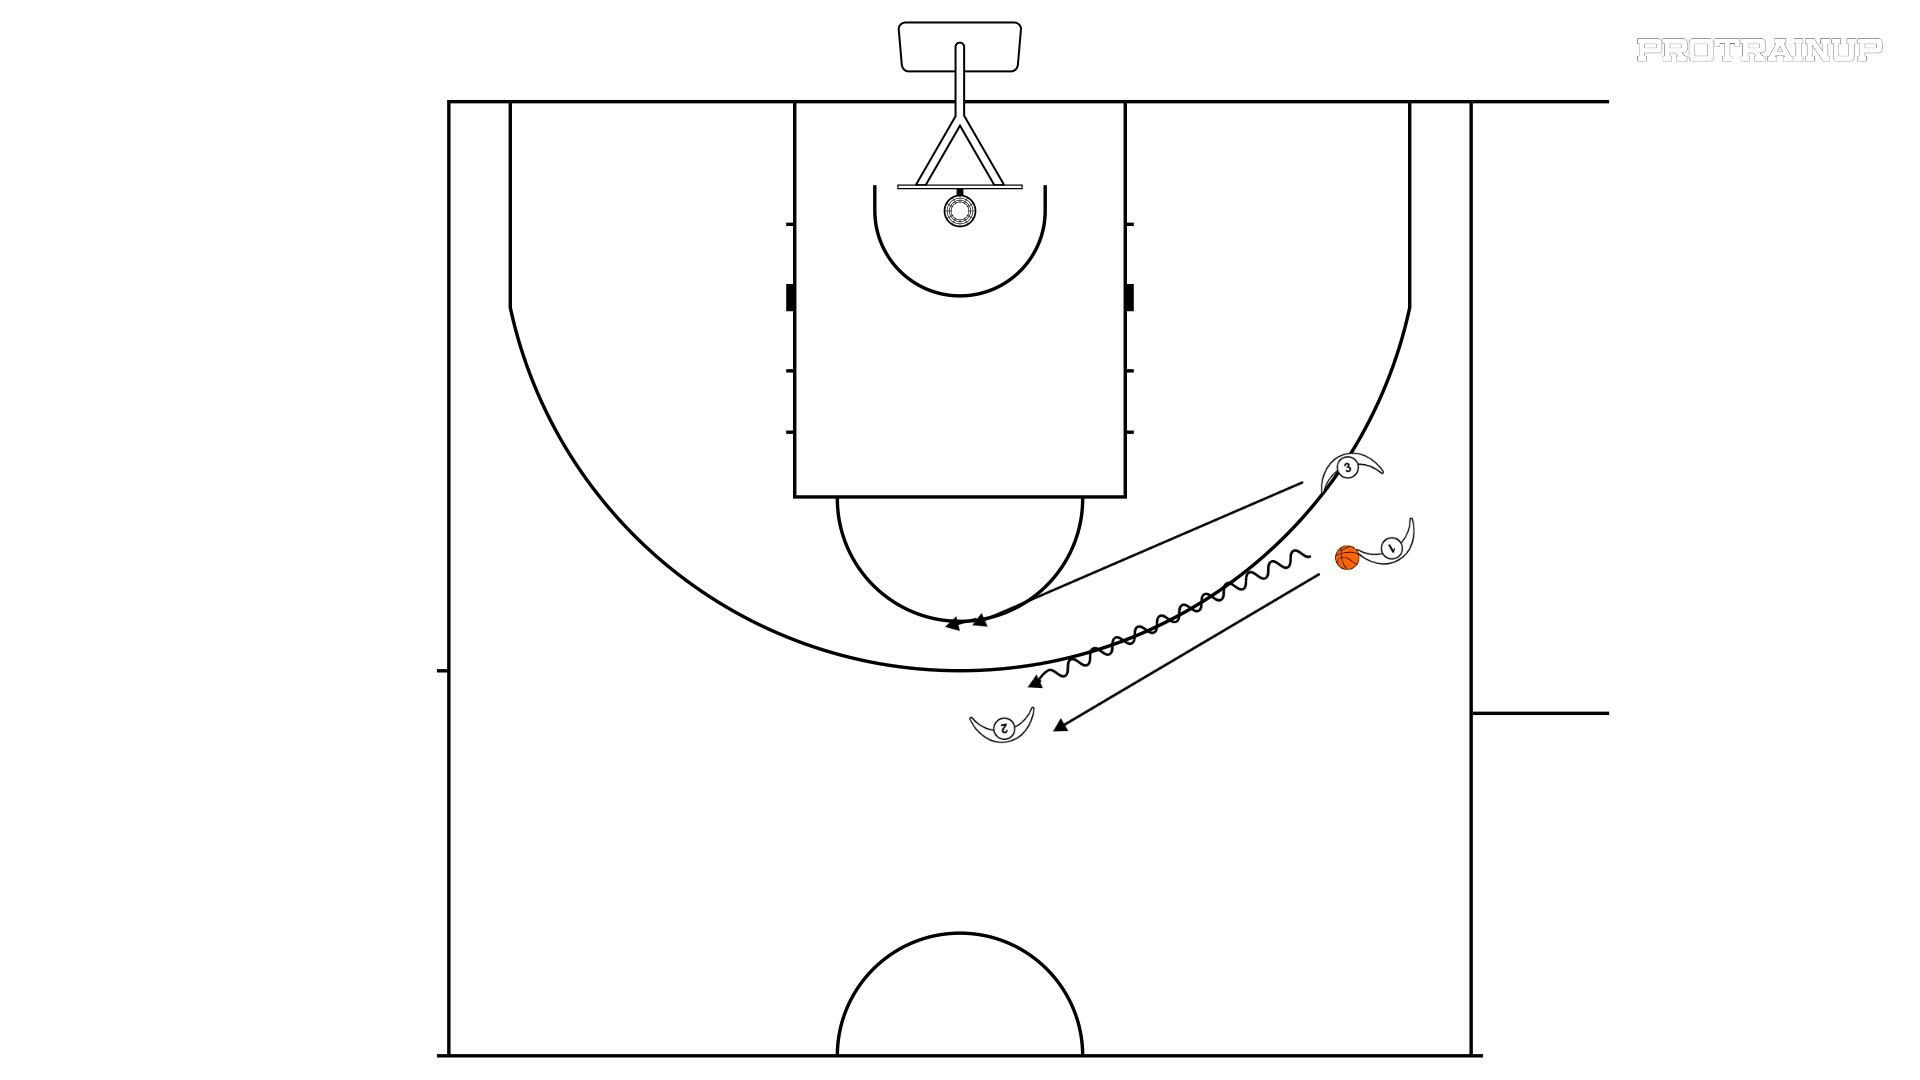 Podania, 2-1 hand off  A i B